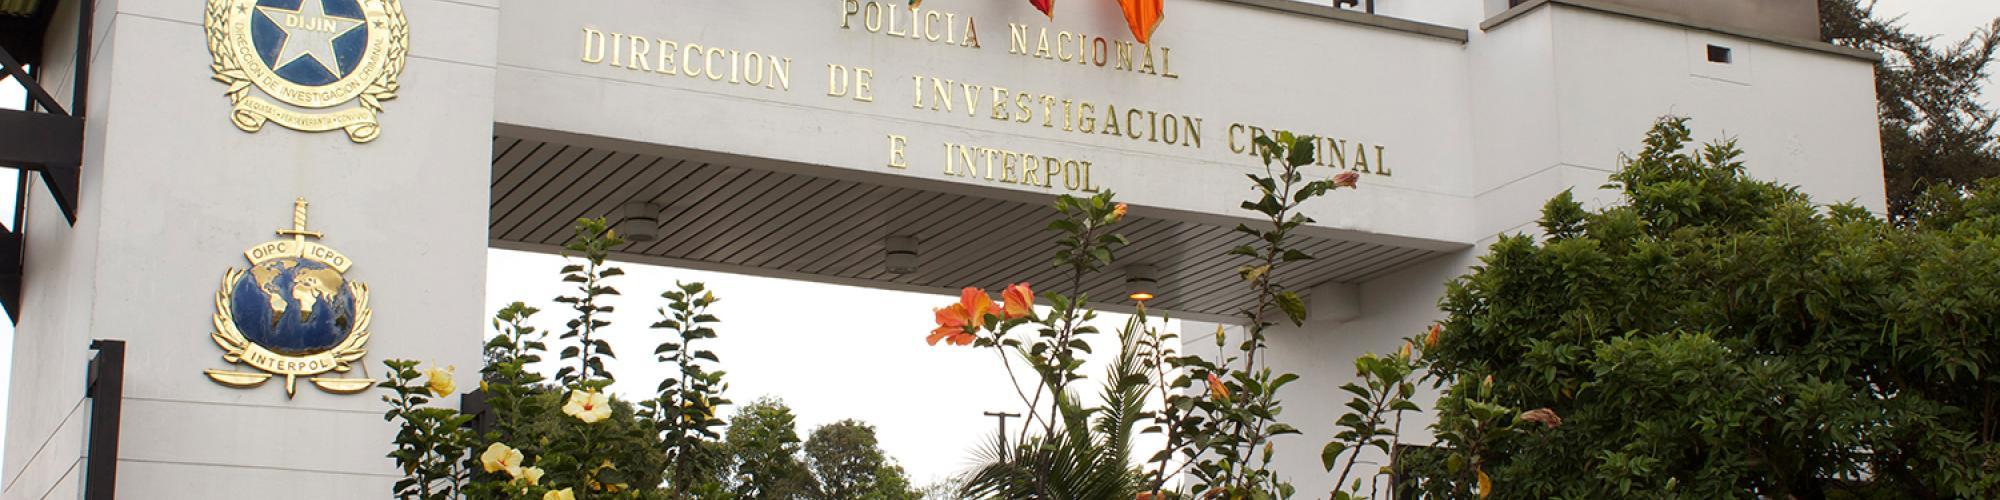 Dirección de Investigación Criminal e INTERPOL de la Policía Nacional - DIJIN